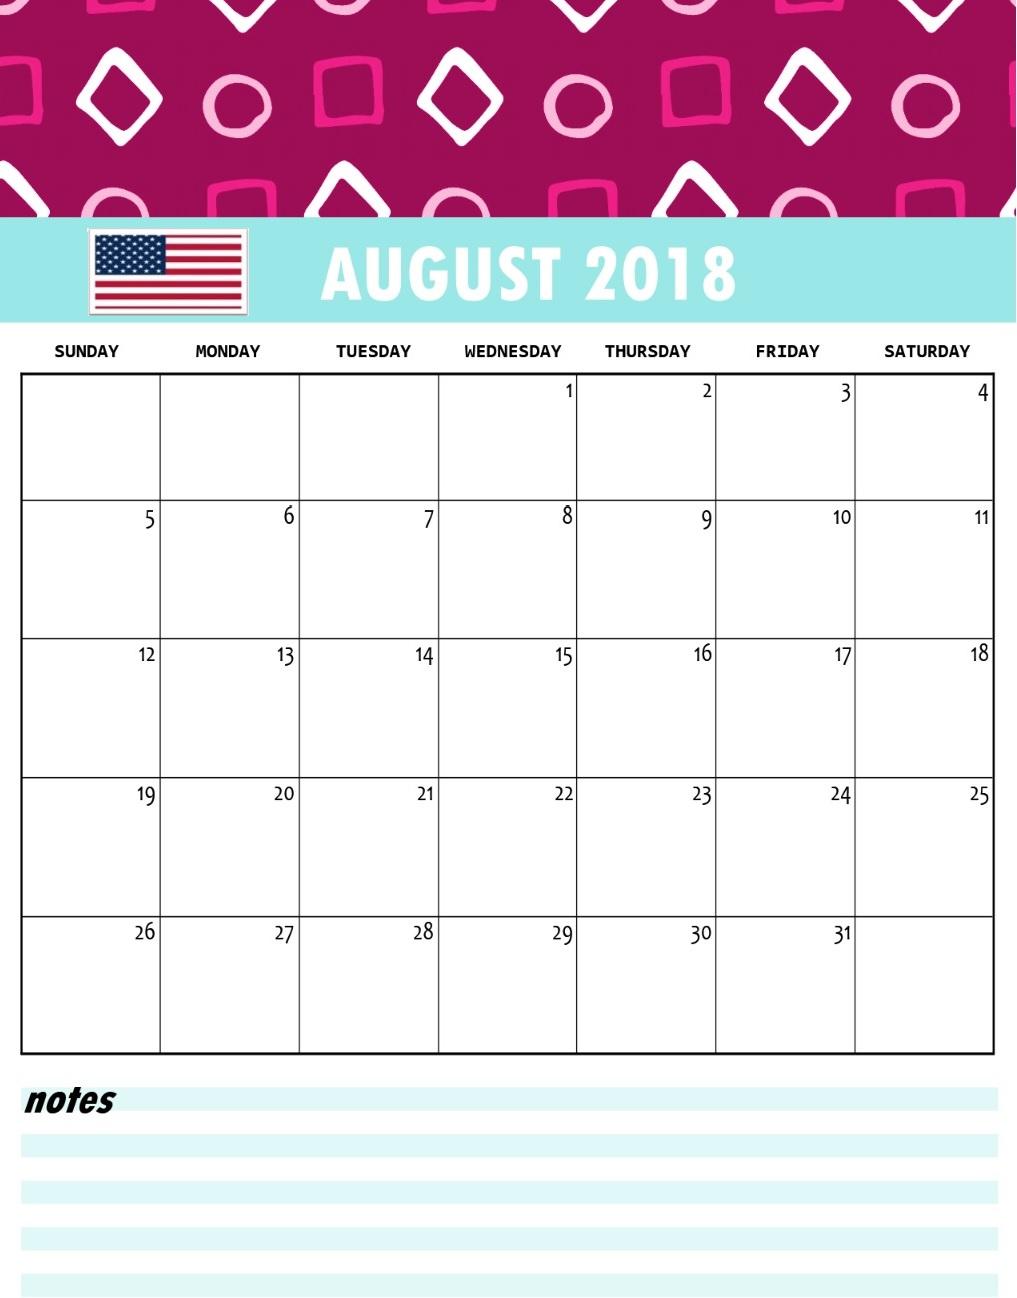 August 2018 USA Holidays Calendar